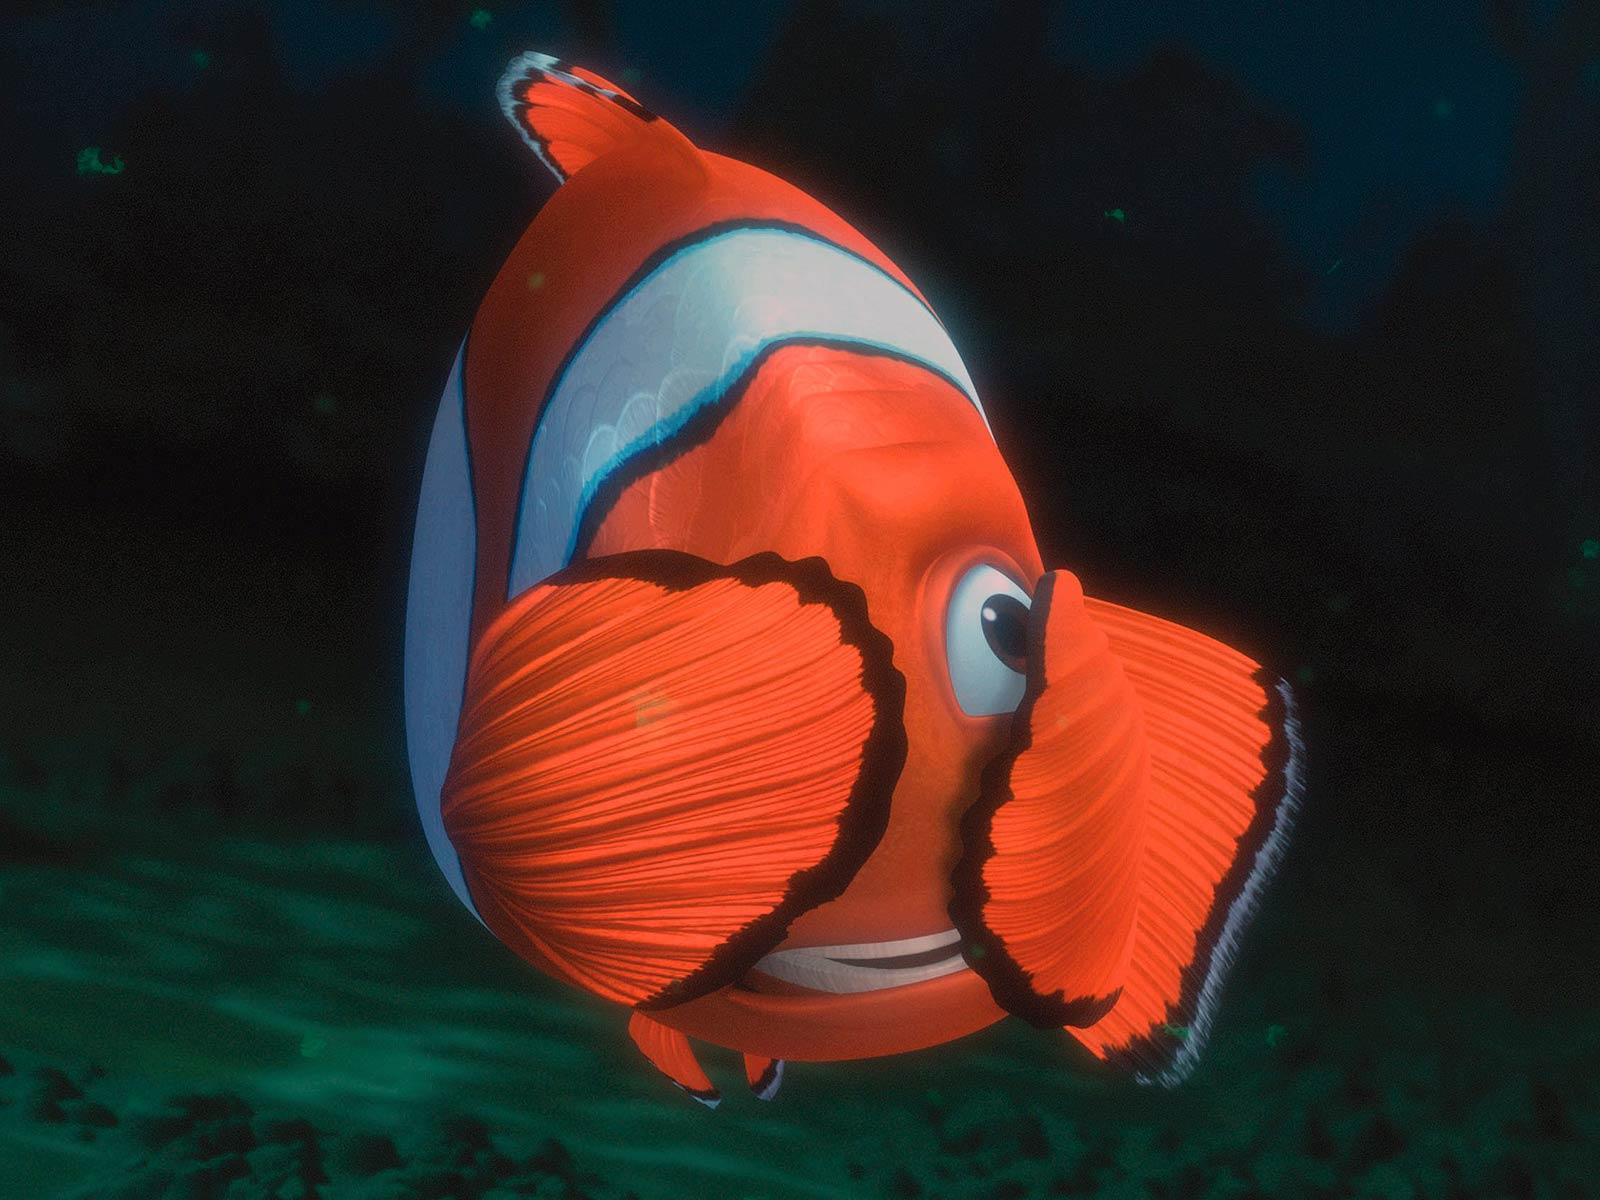 http://4.bp.blogspot.com/-mWH872Q_UAE/TnpSkGu_loI/AAAAAAAABQ8/ByfOsYNXeRQ/s1600/Finding_Nemo_Fish_Marlin_Funny_3D_HD_Wallpapers_Vvallpaper.net.jpg.jpg